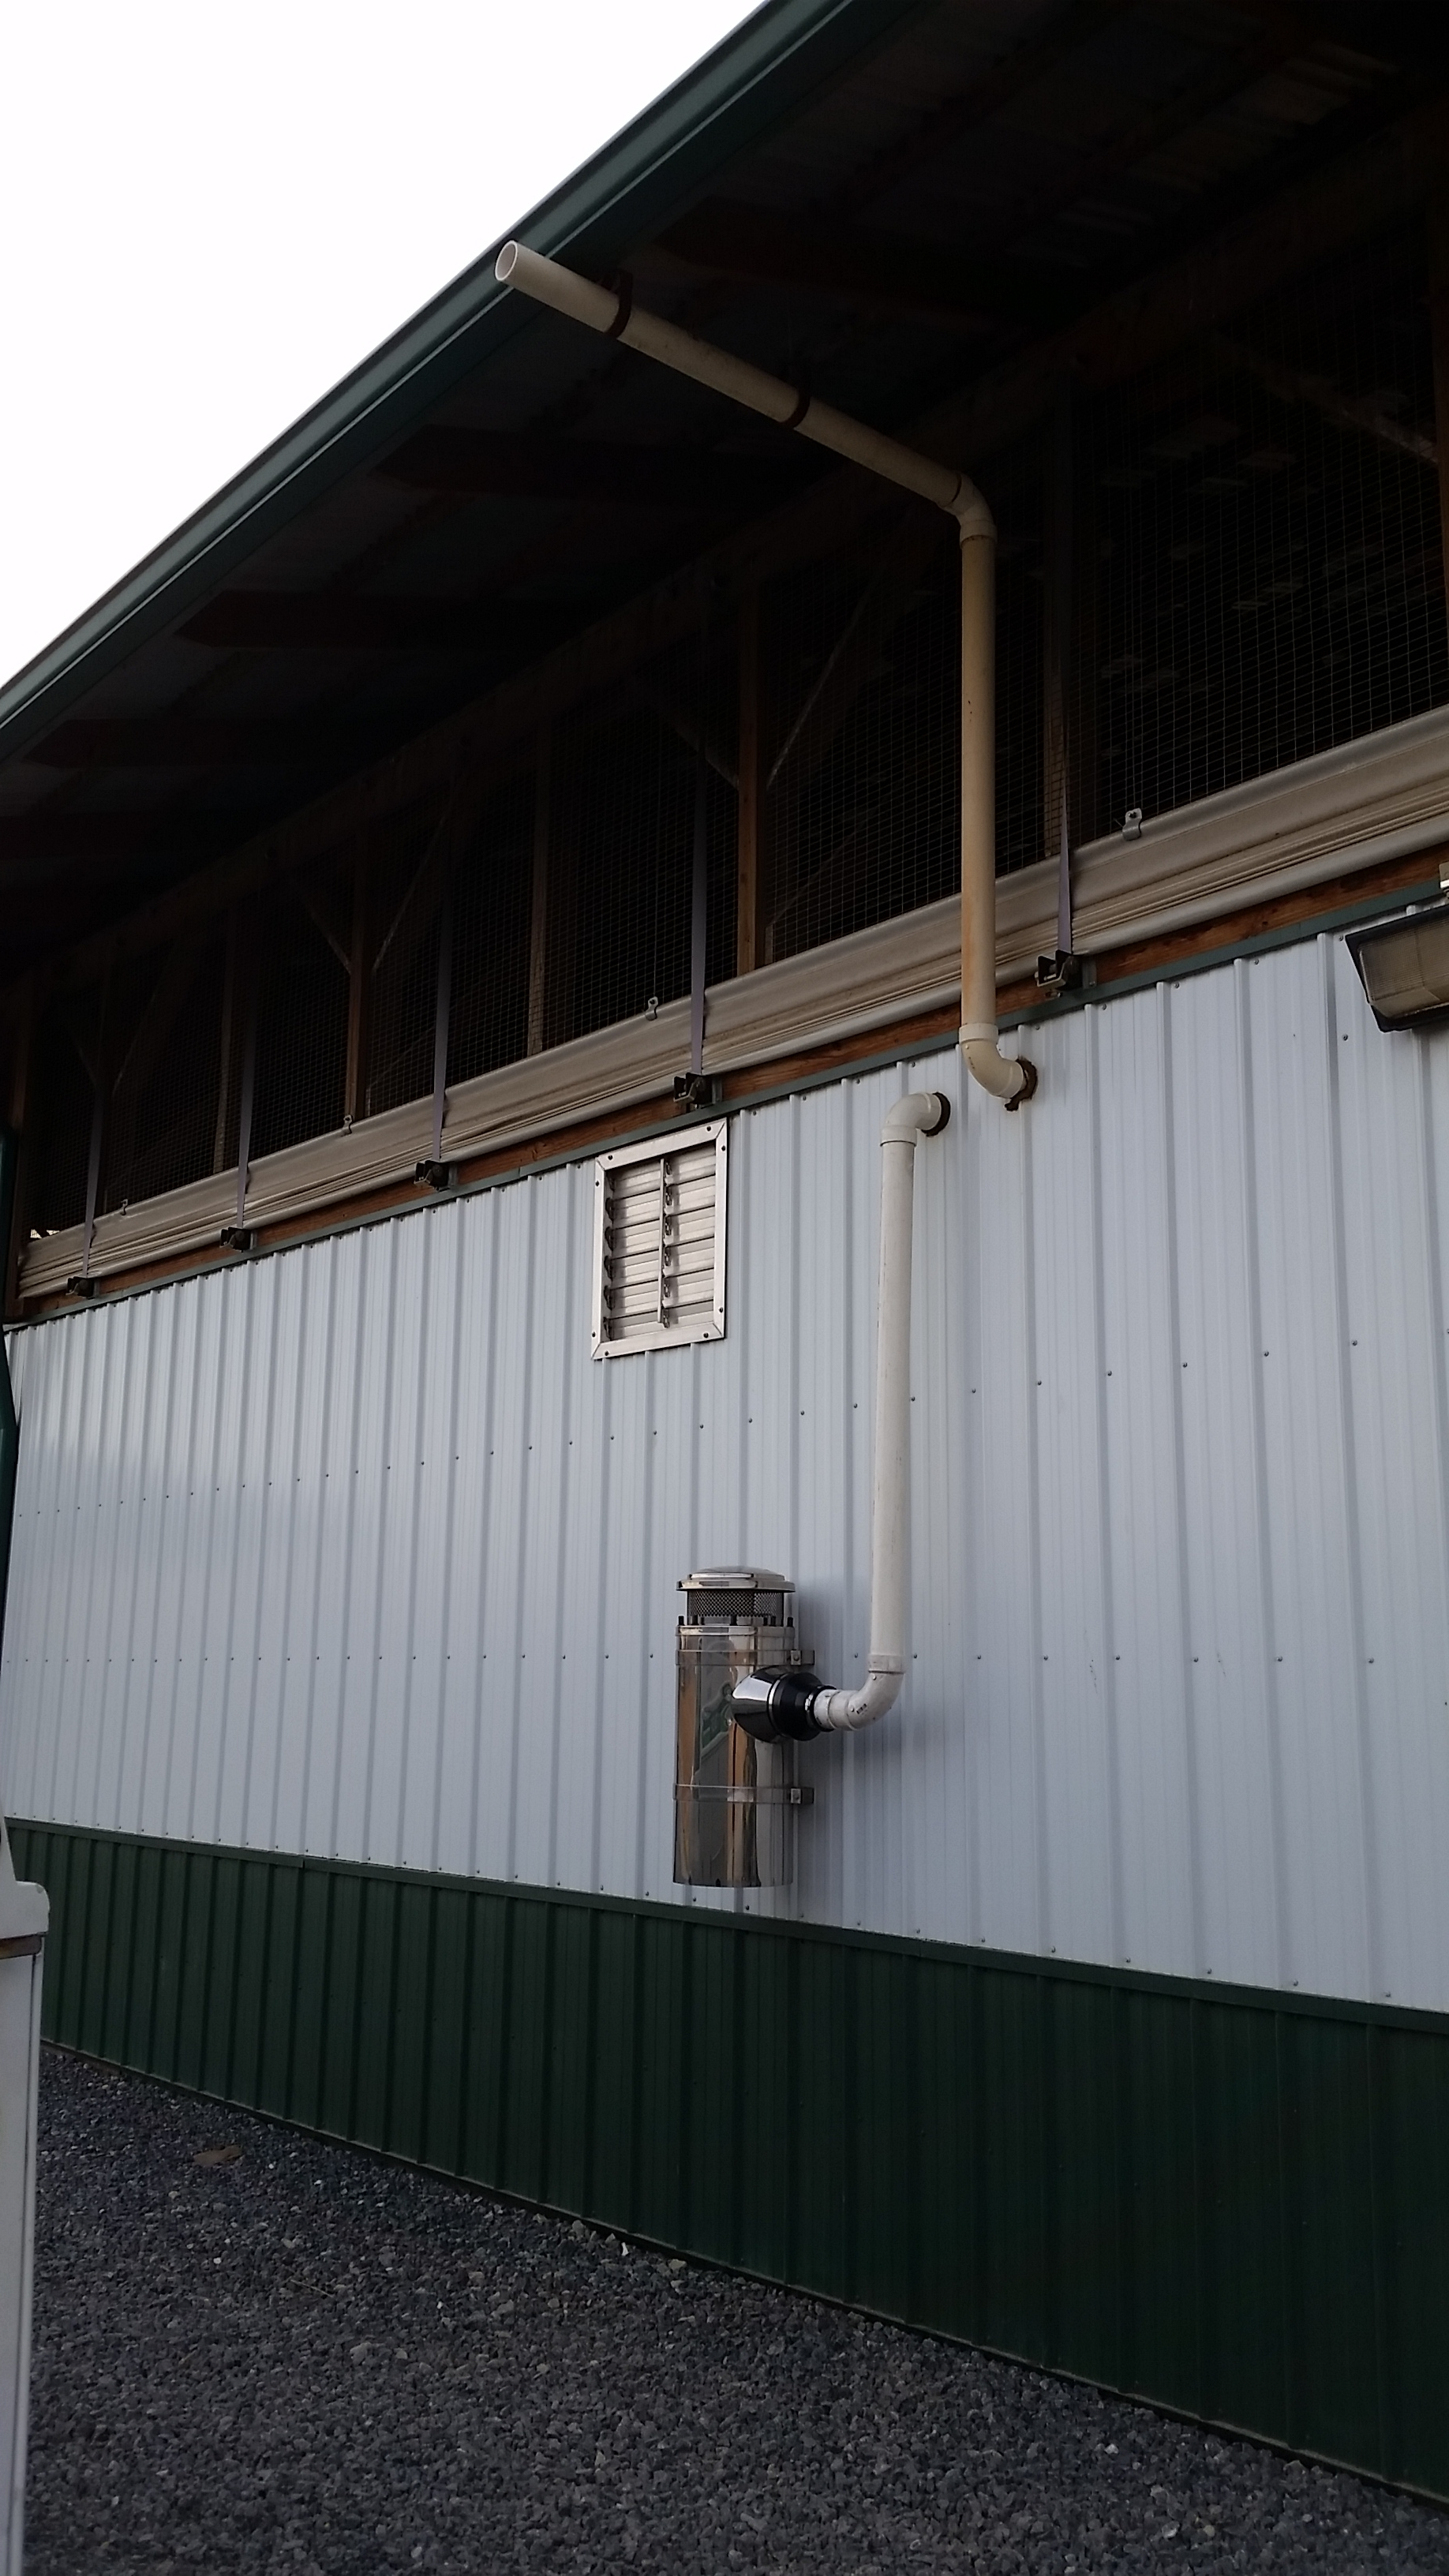 Munchkin Boiler leak — Heating Help: The Wall